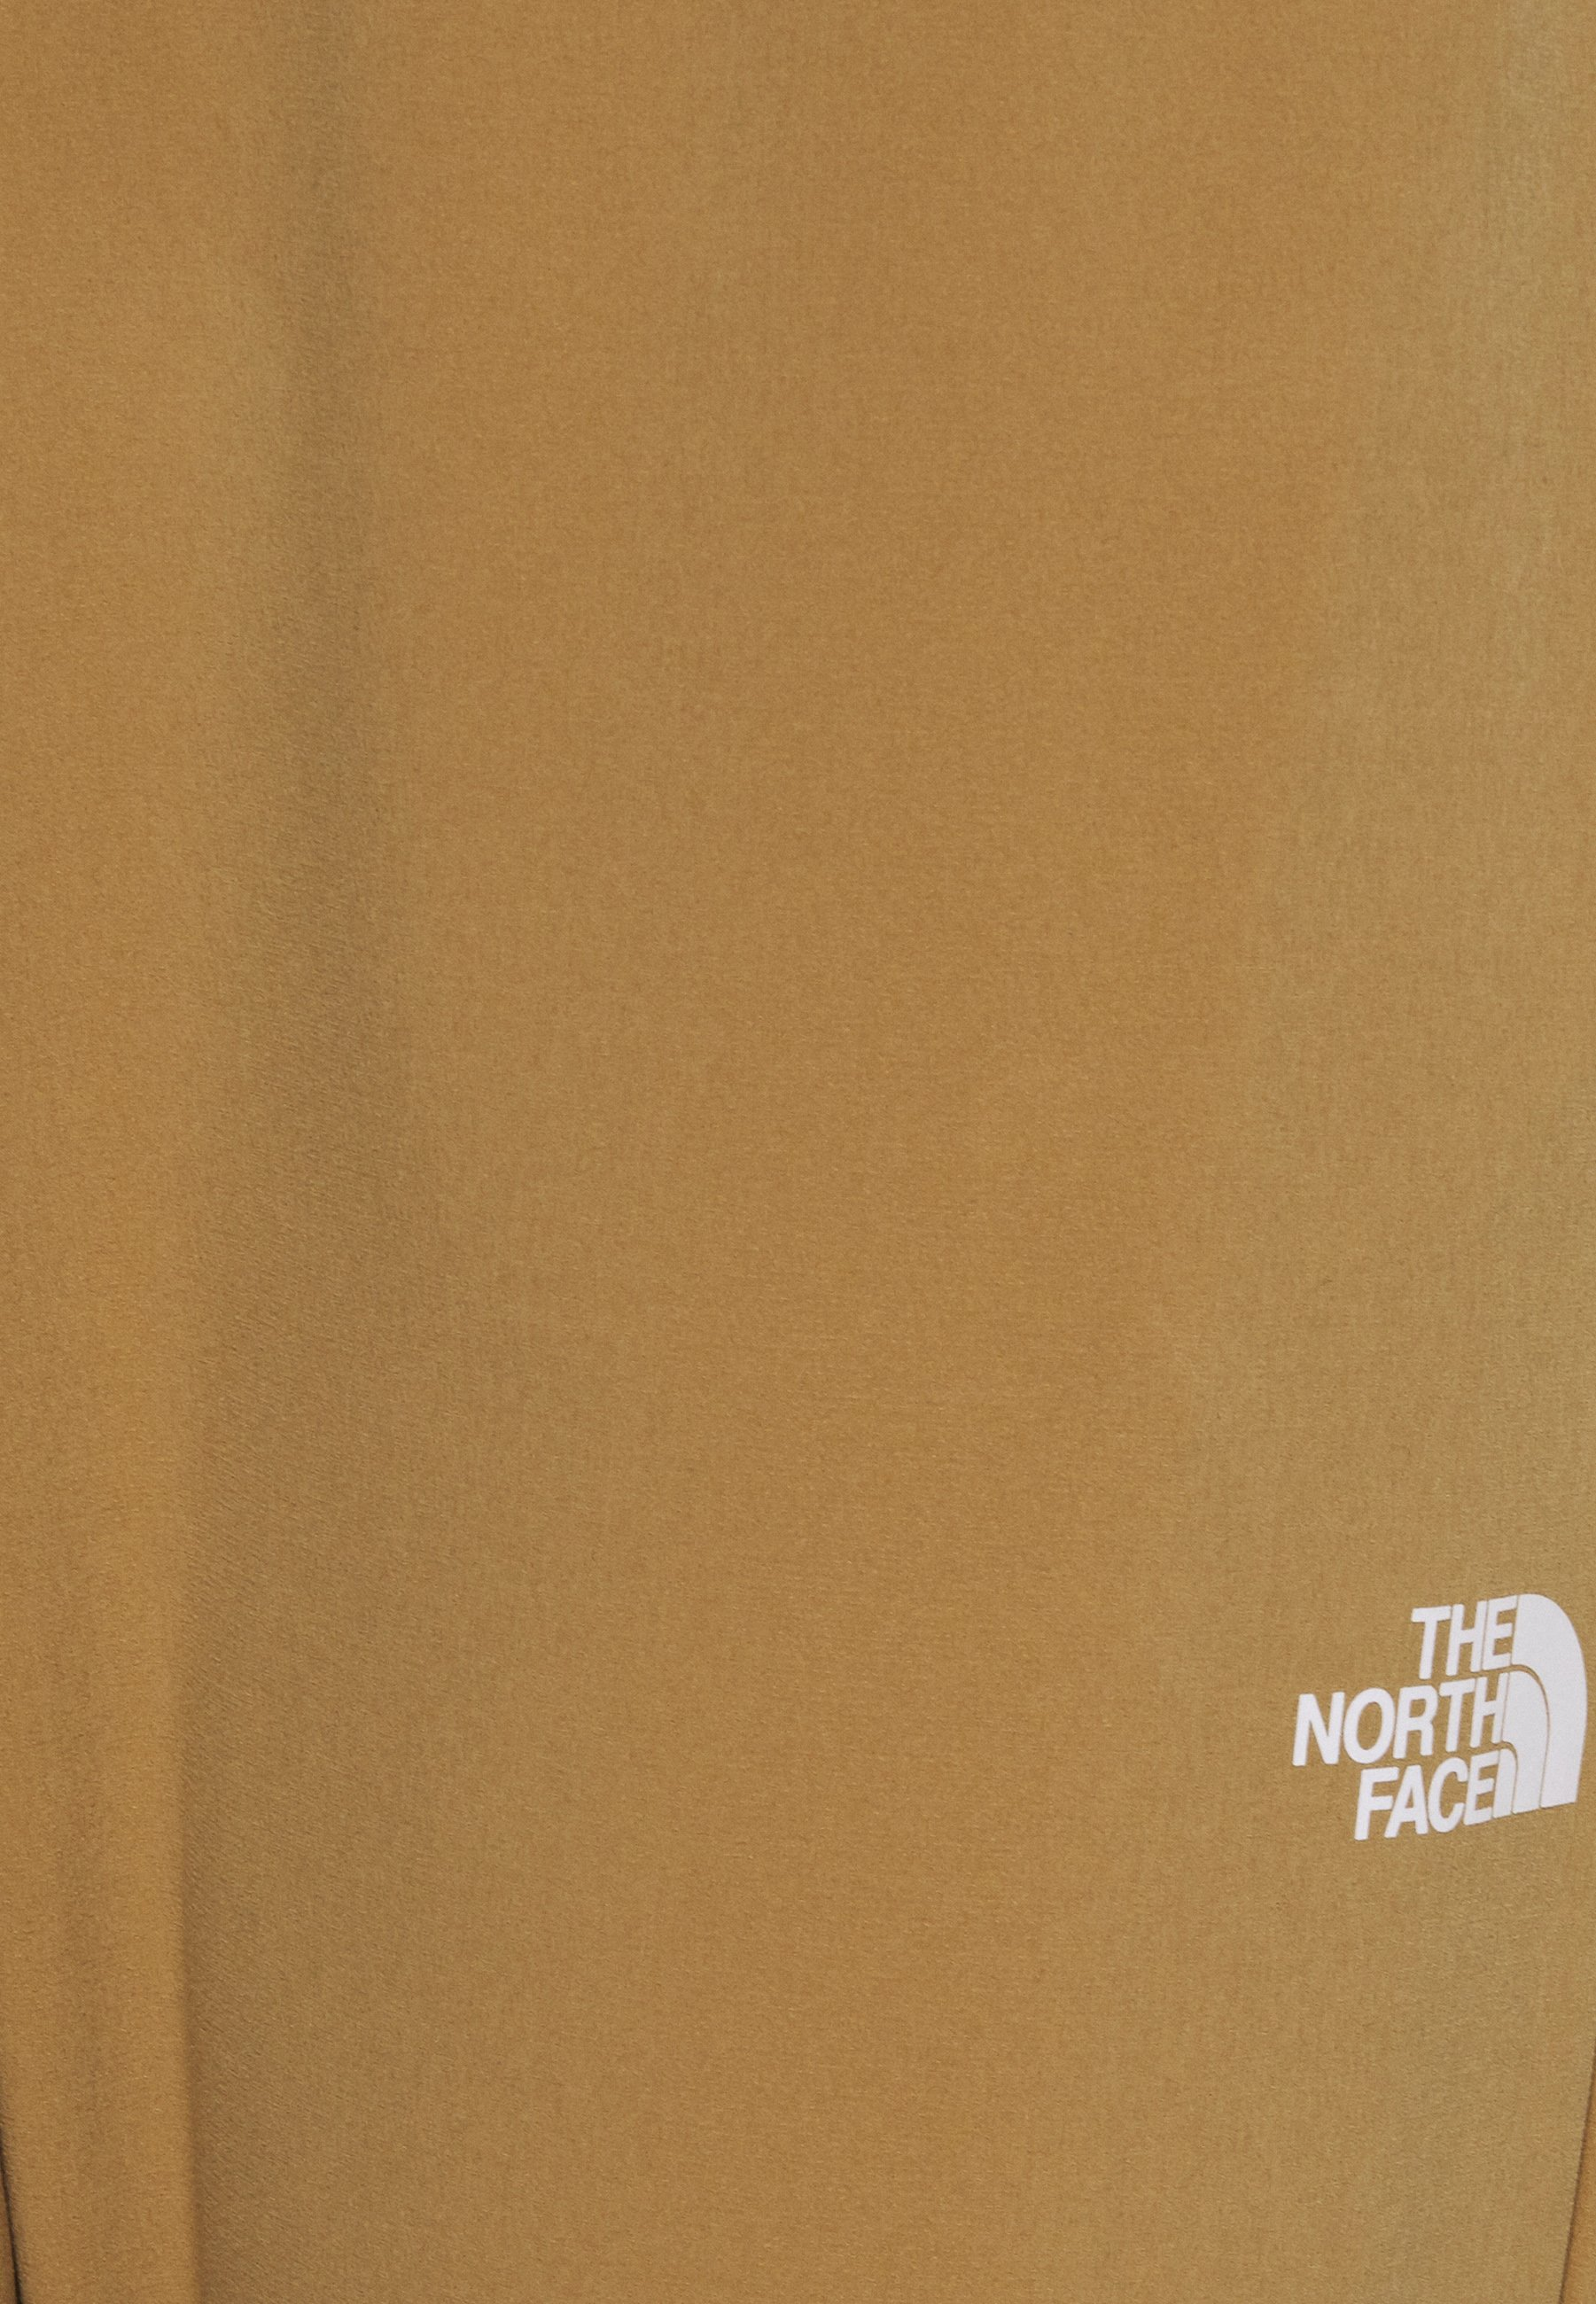 2020 New Limited New Women's Clothing The North Face ACTIVE TRAIL HYBRID PANT Trousers moab khaki kK8kKrLEW ZjtvPFcKa